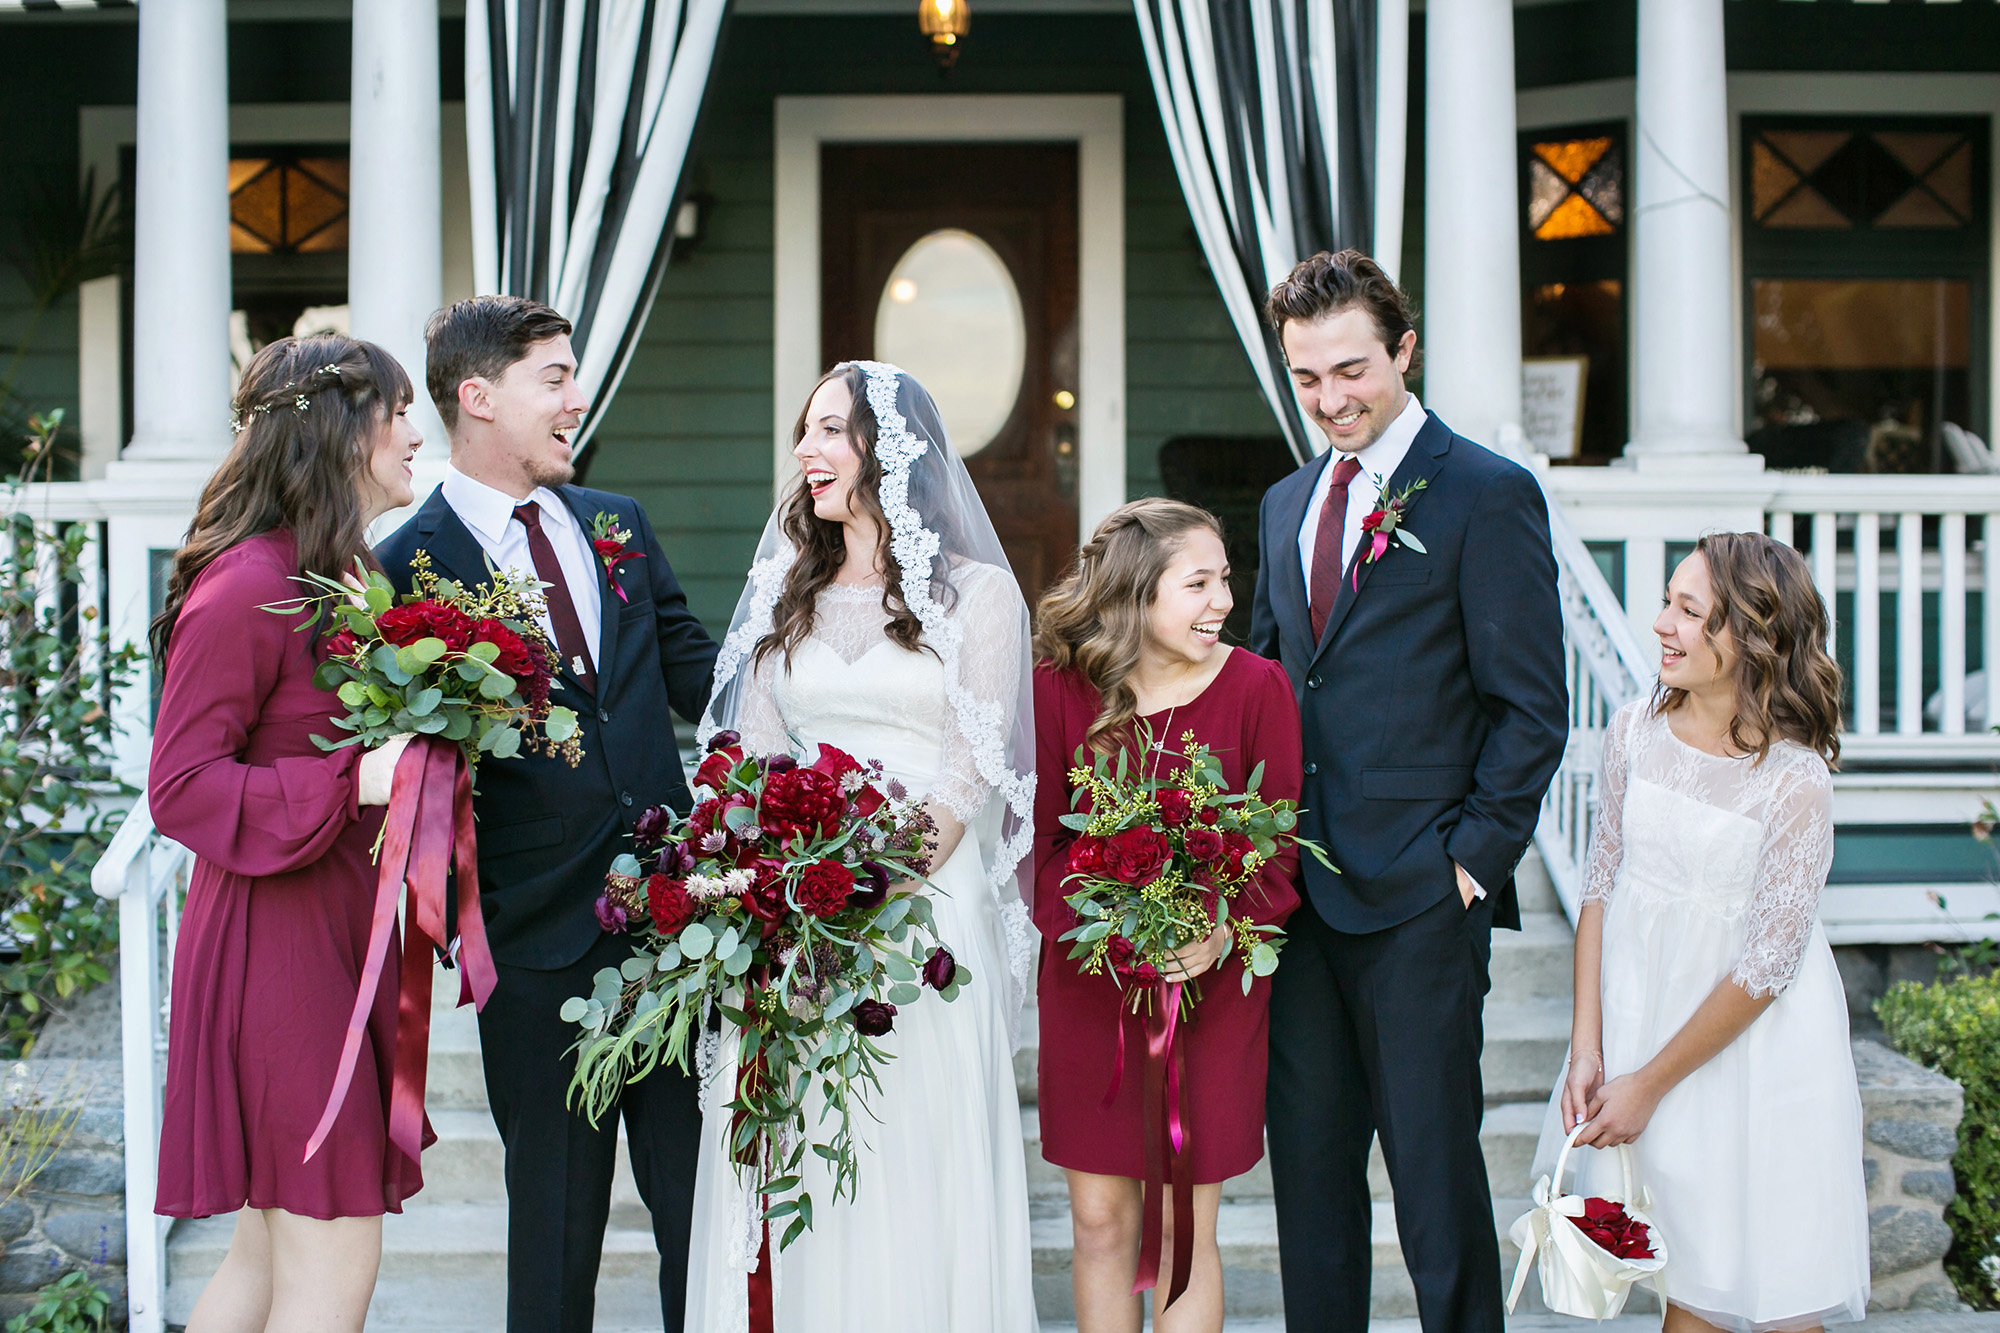 christmas-house-weddings-receptions-carrie-vines-128.jpg